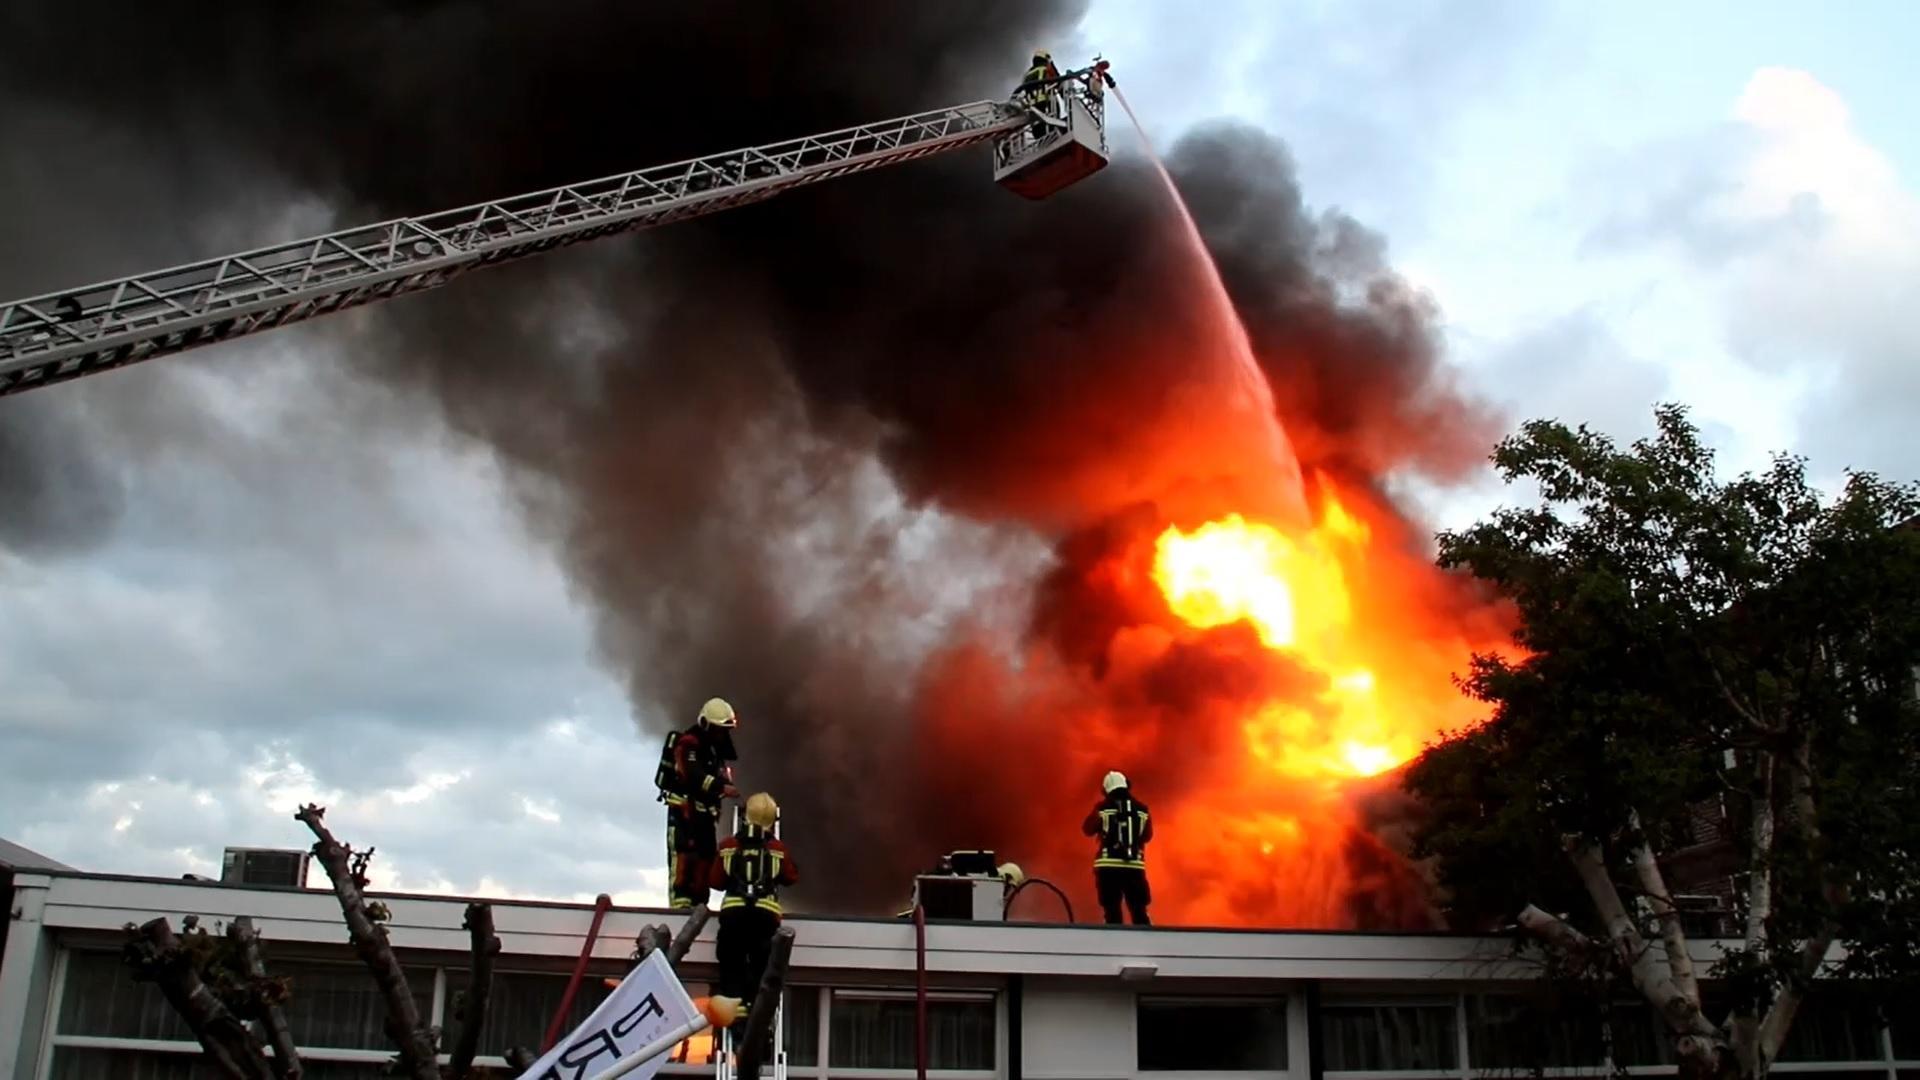 Grote brand in bollenloods in Voorhout; rook in richting van Lisserbroek [video]